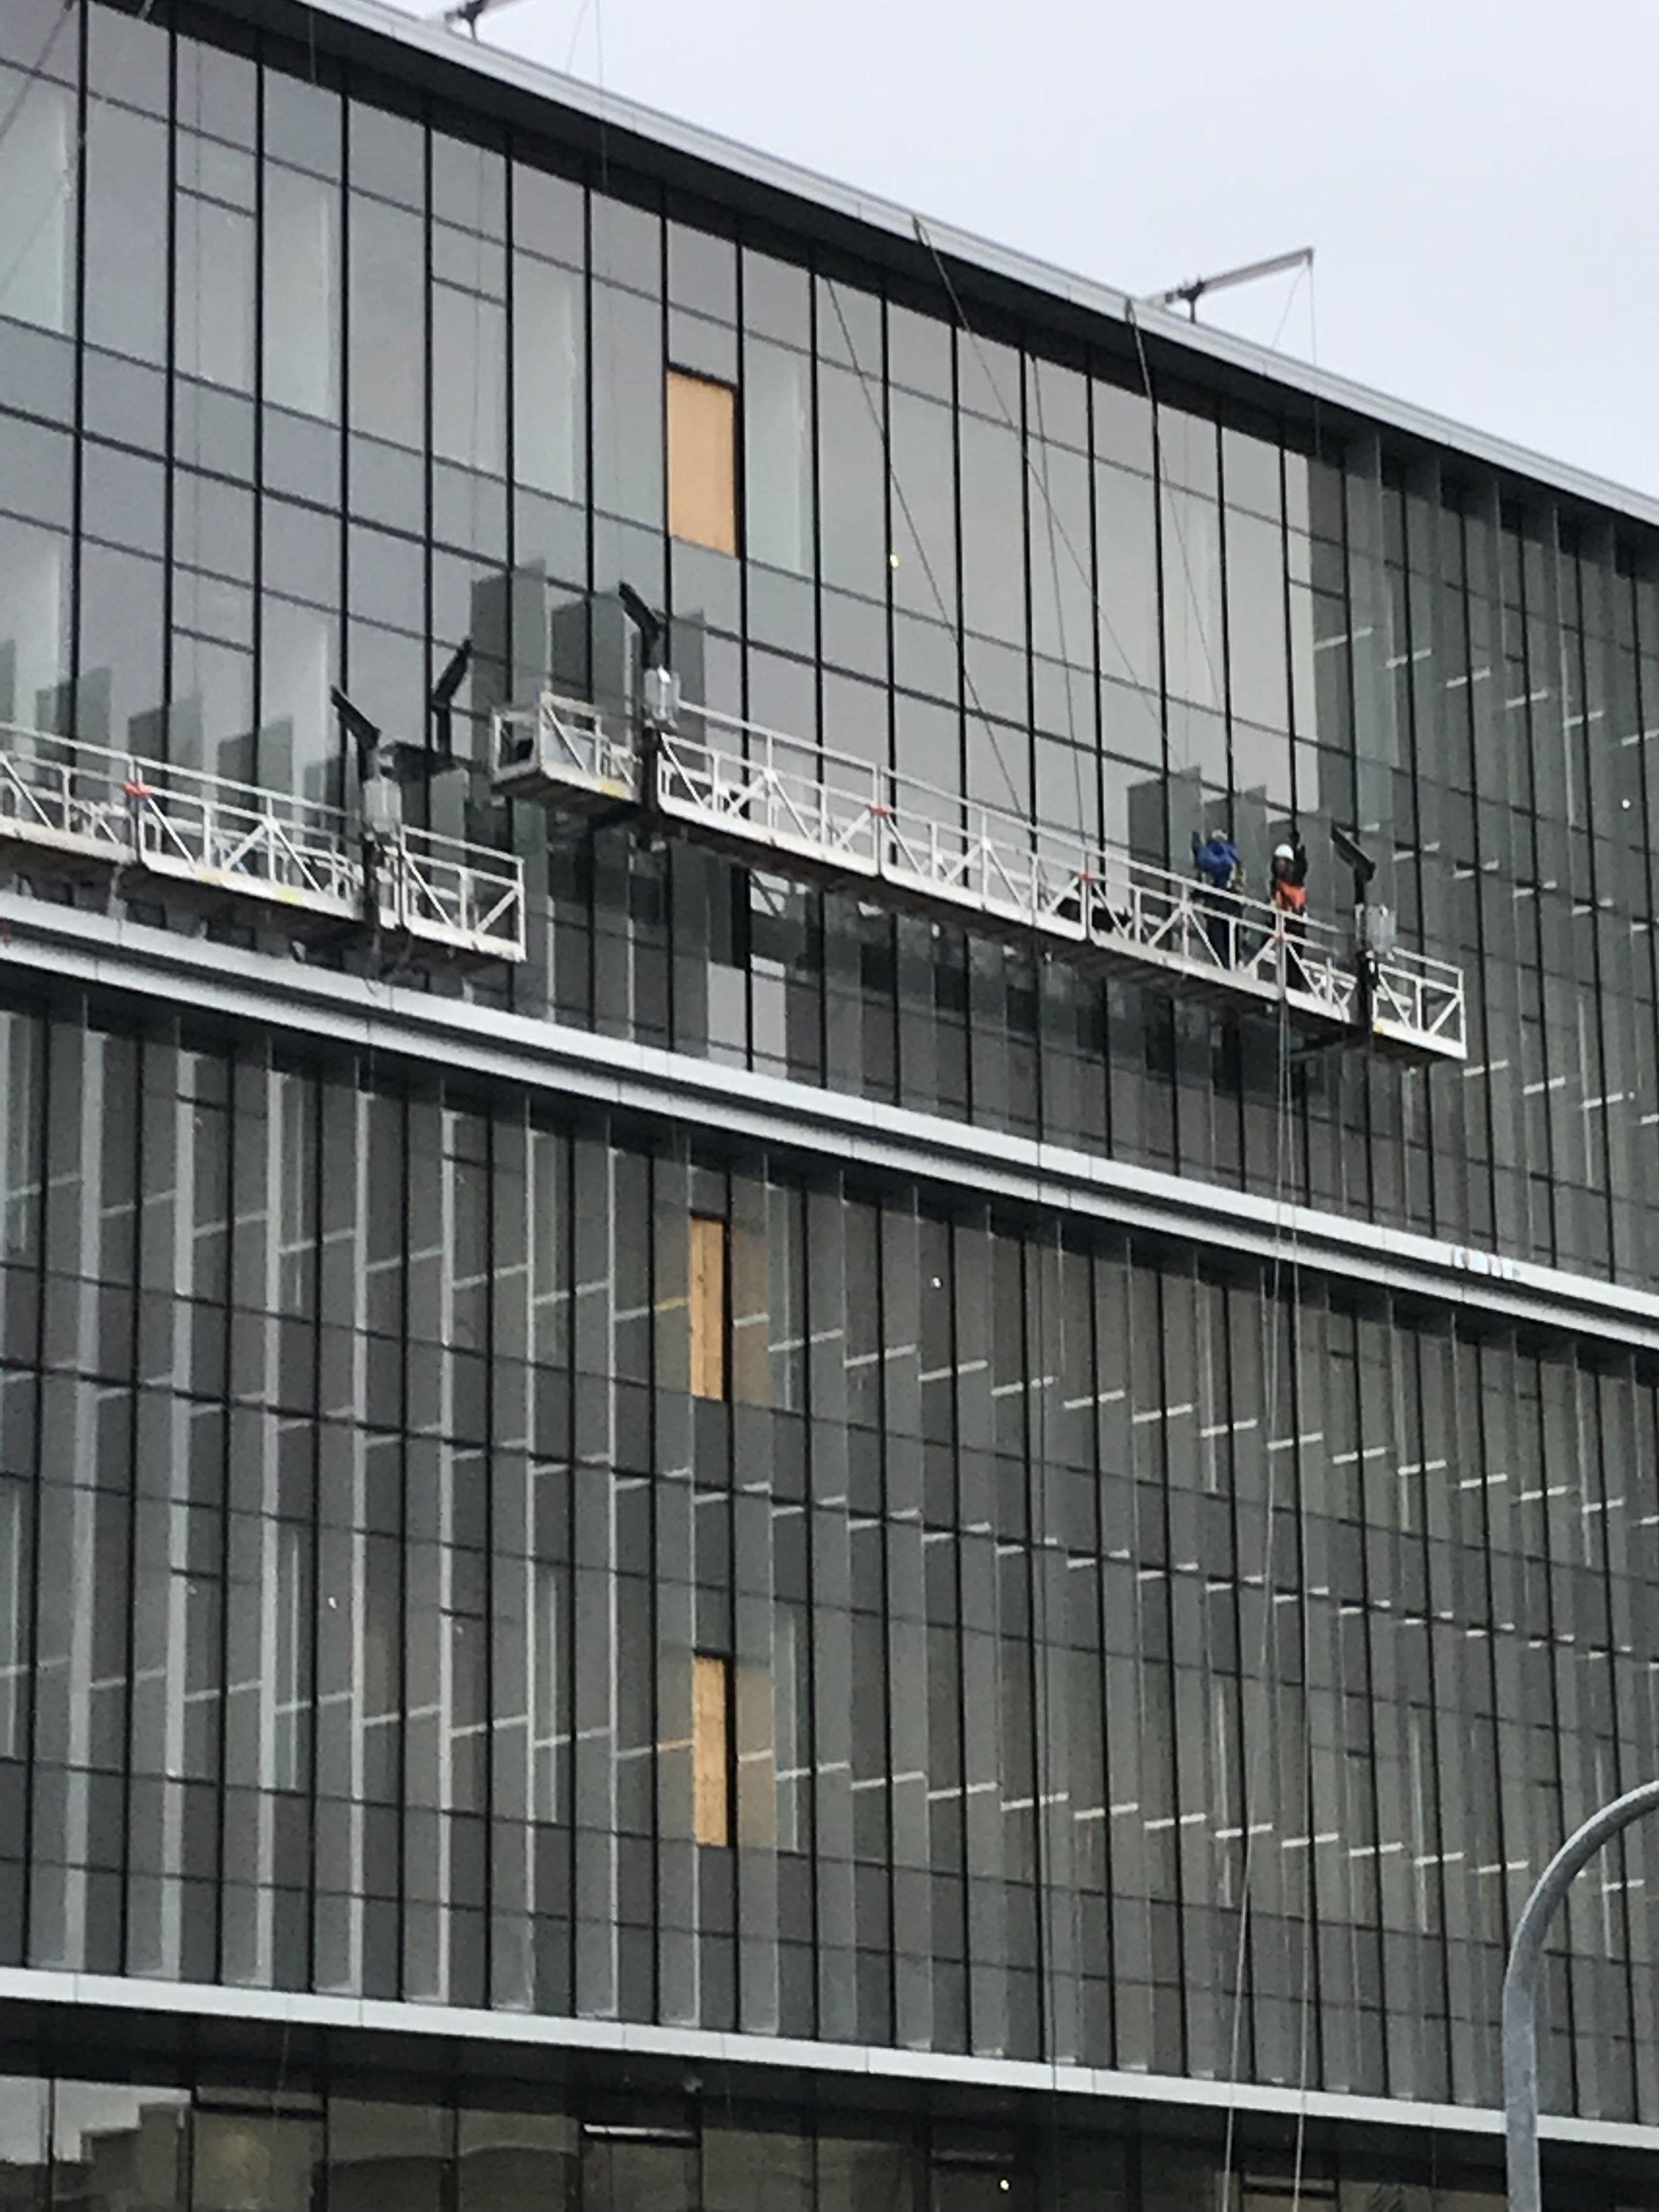 Glass solar fin installation in progress